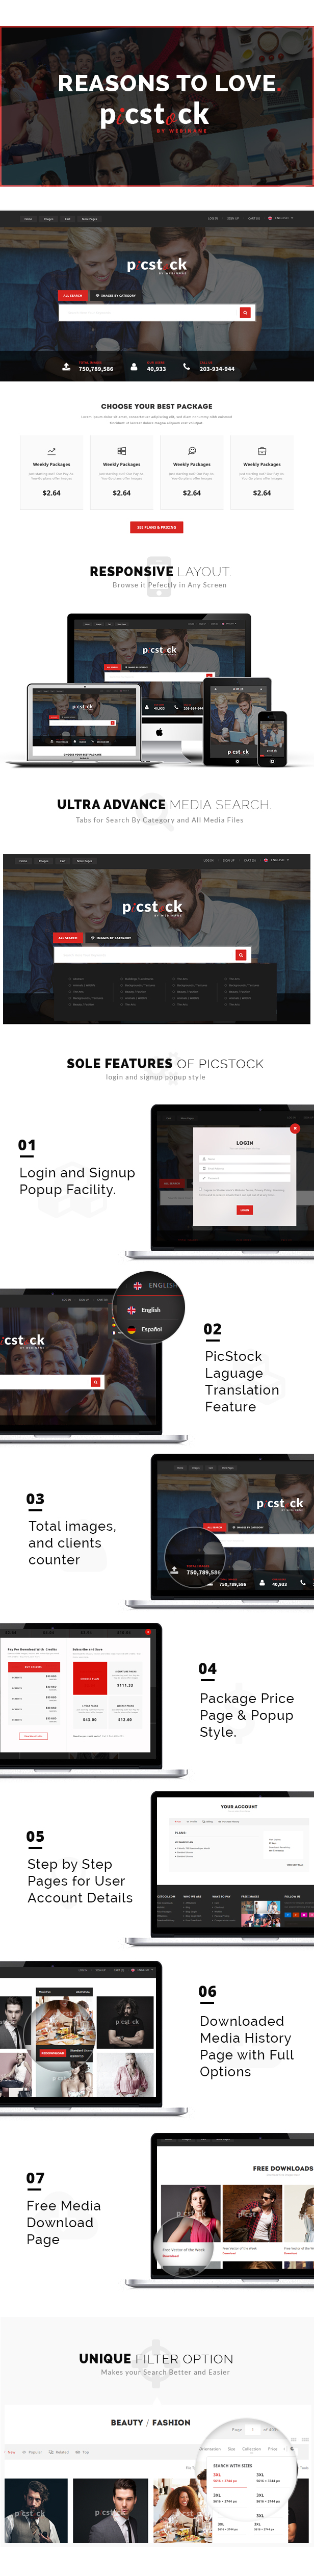 PicStock- Ultra Advanced Stock Media HTML Template - 1